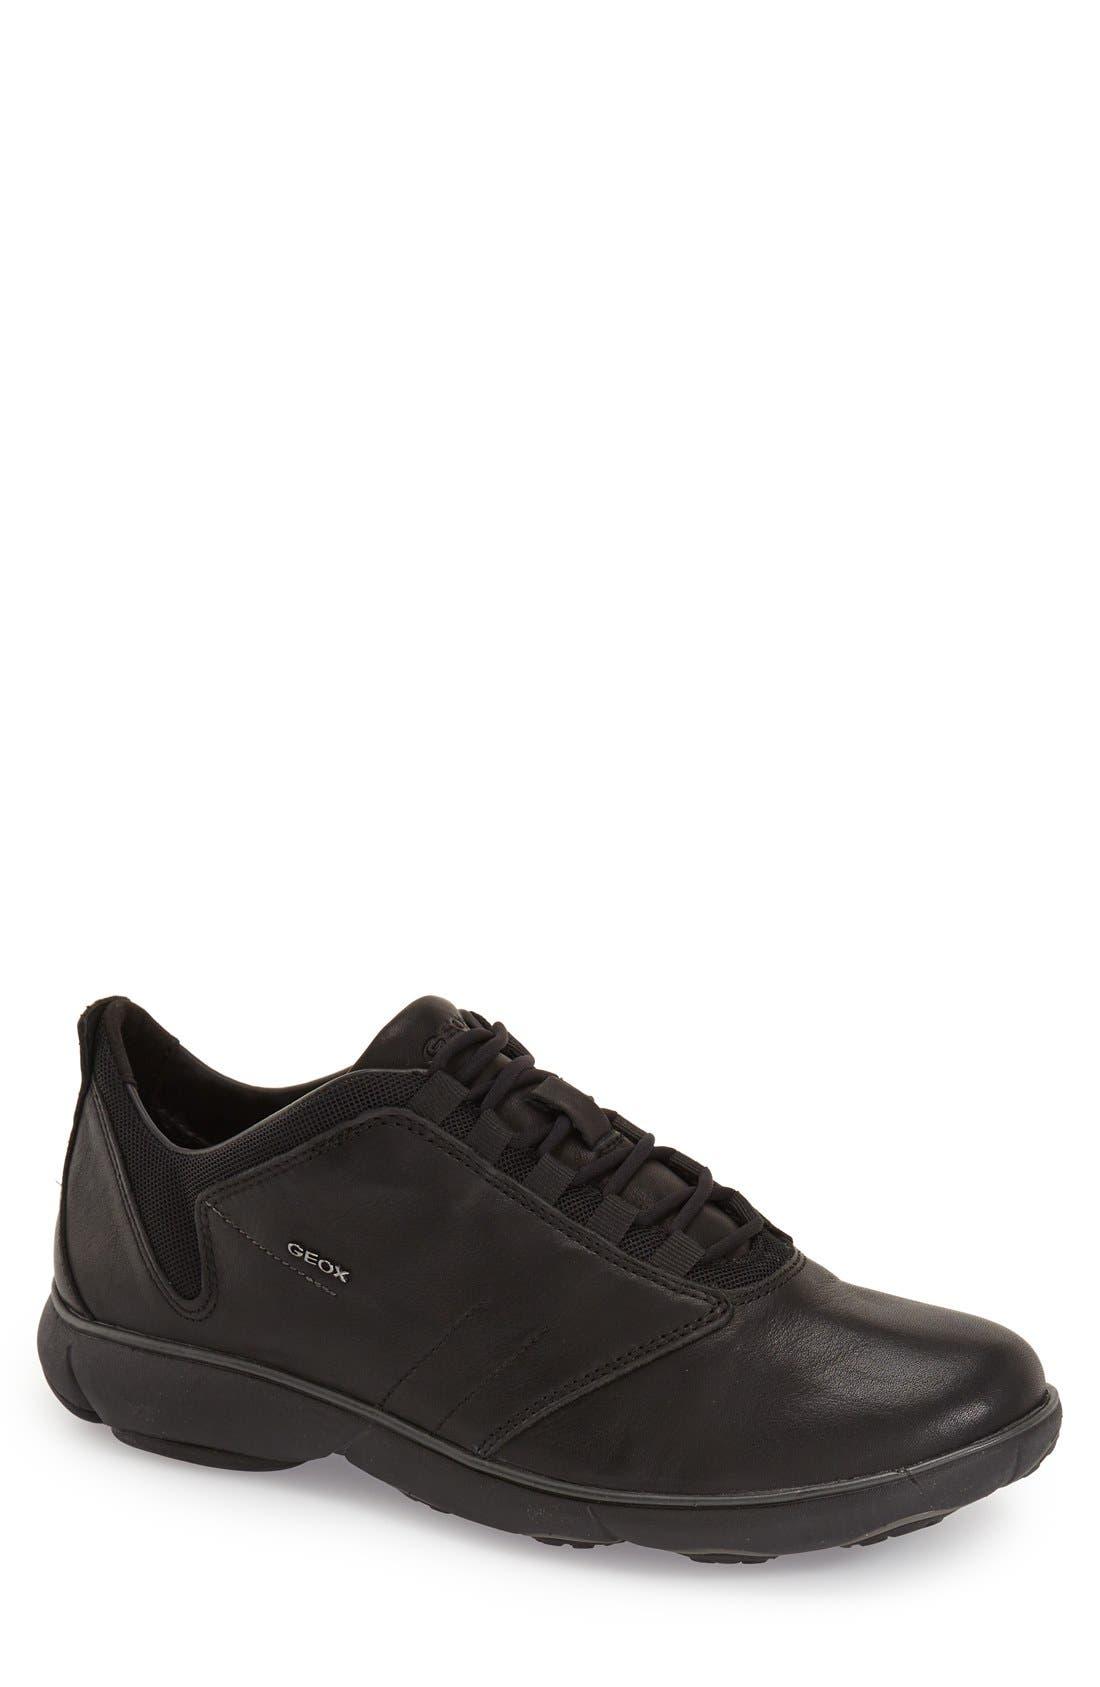 Nebula 11 Sneaker,                         Main,                         color, BLACK OILY LEATHER